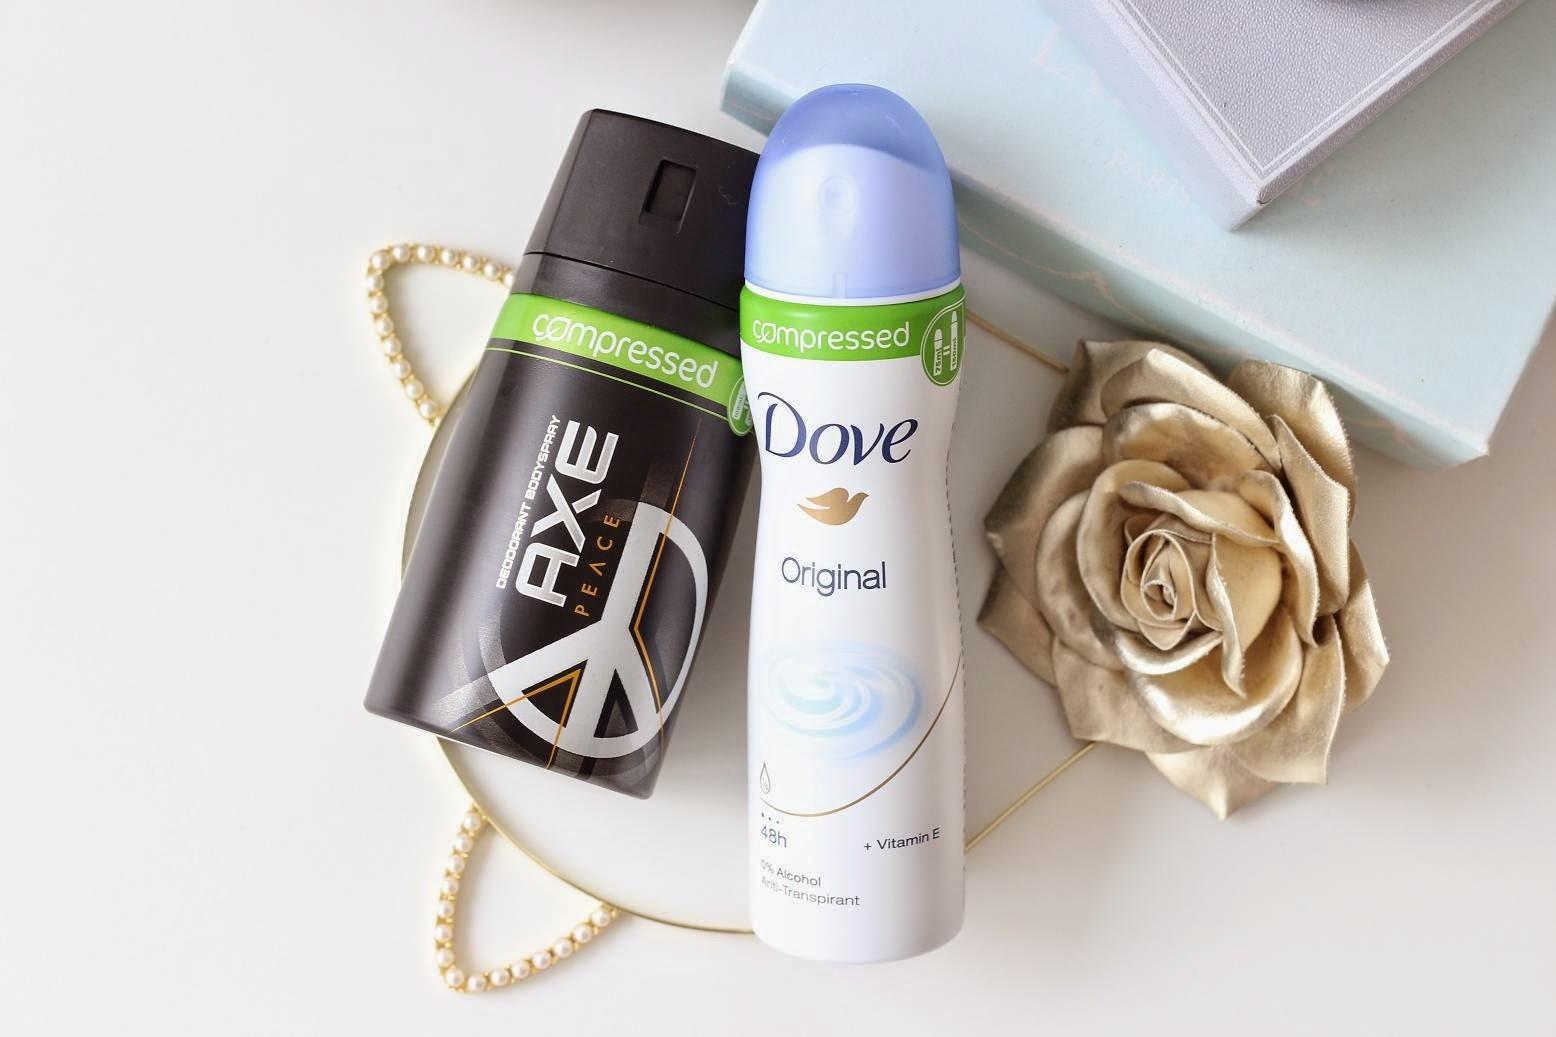 Compressed deodorants